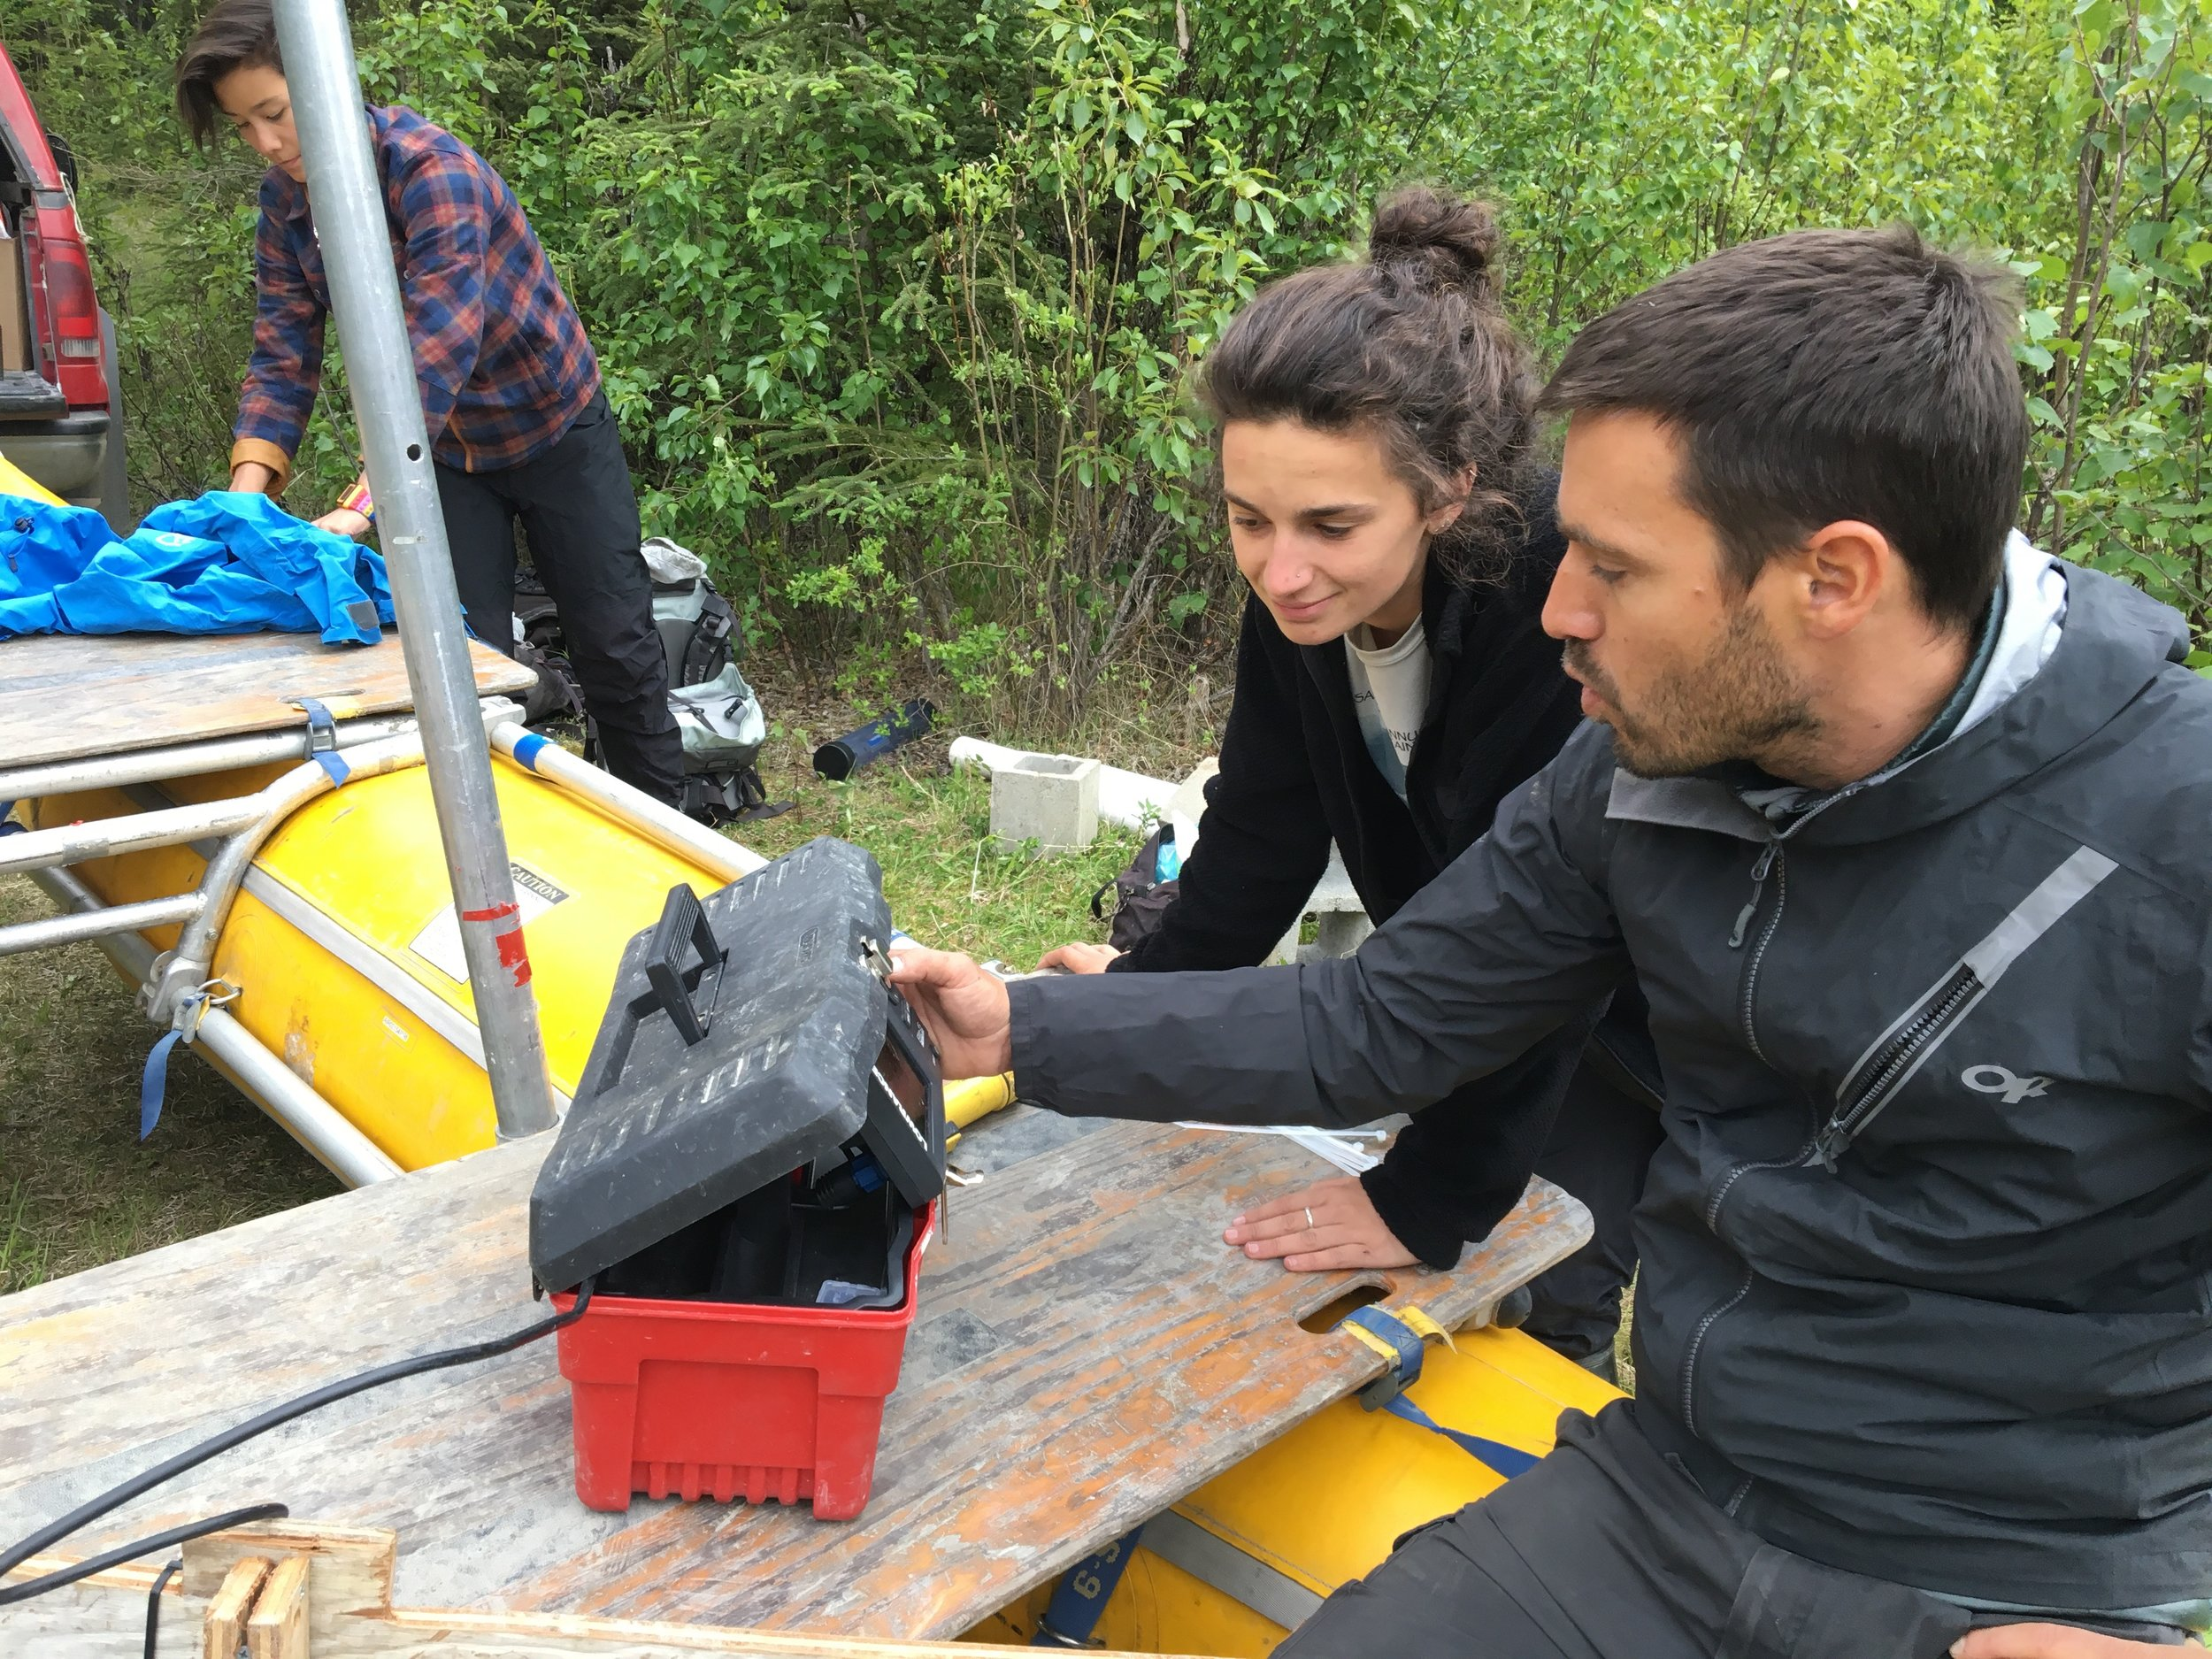 David Fortin and Ellie Broadman getting ready to create a bathymetric map at Sunken Island Lake